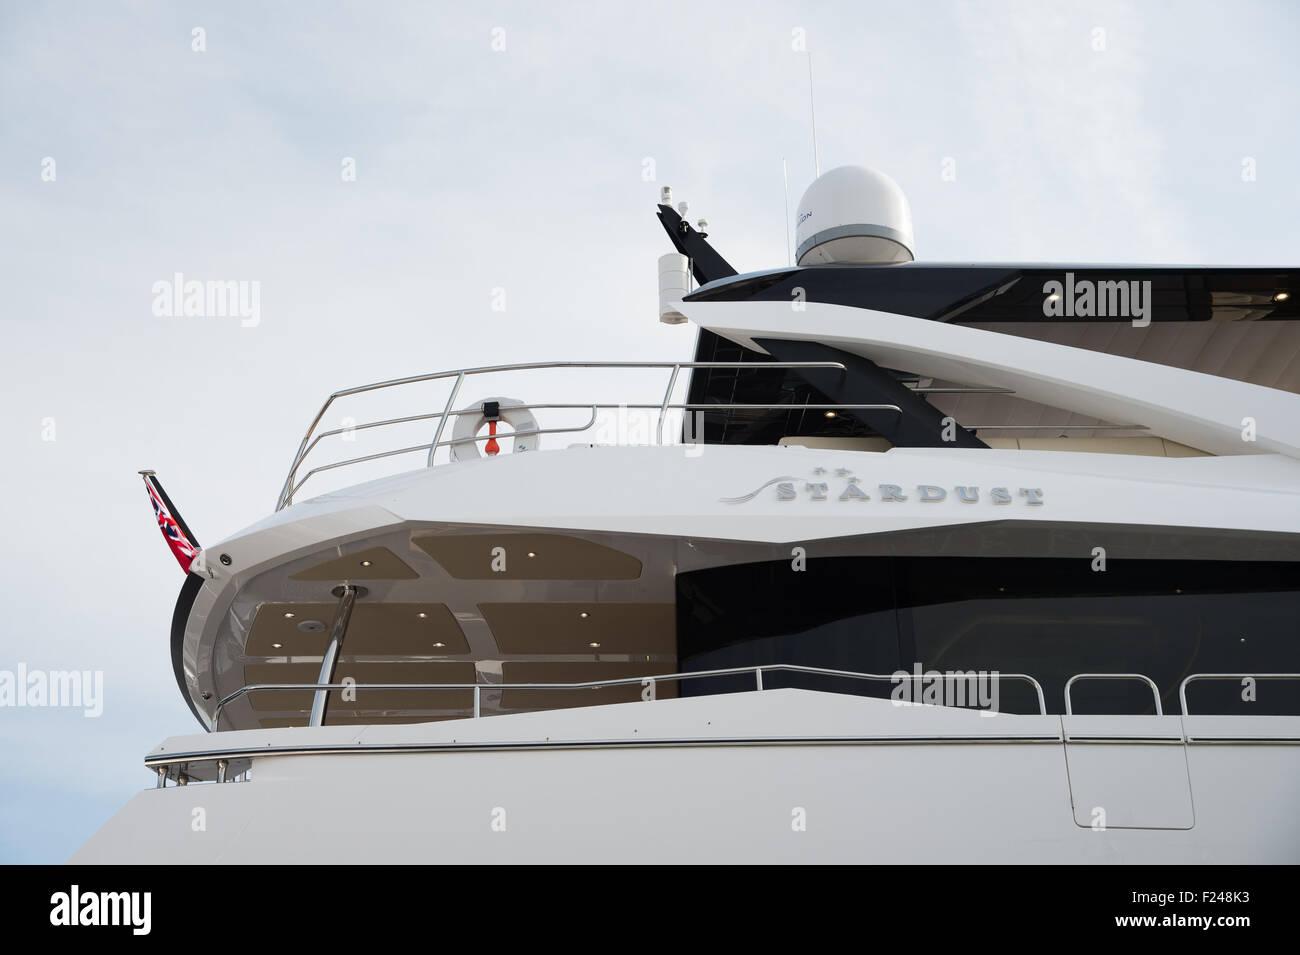 Southampton, UK. 11. September 2015. Southampton Boat Show 2015. Die Sunseeker Yacht Stardust auf ihrem Stand auf Stockfoto